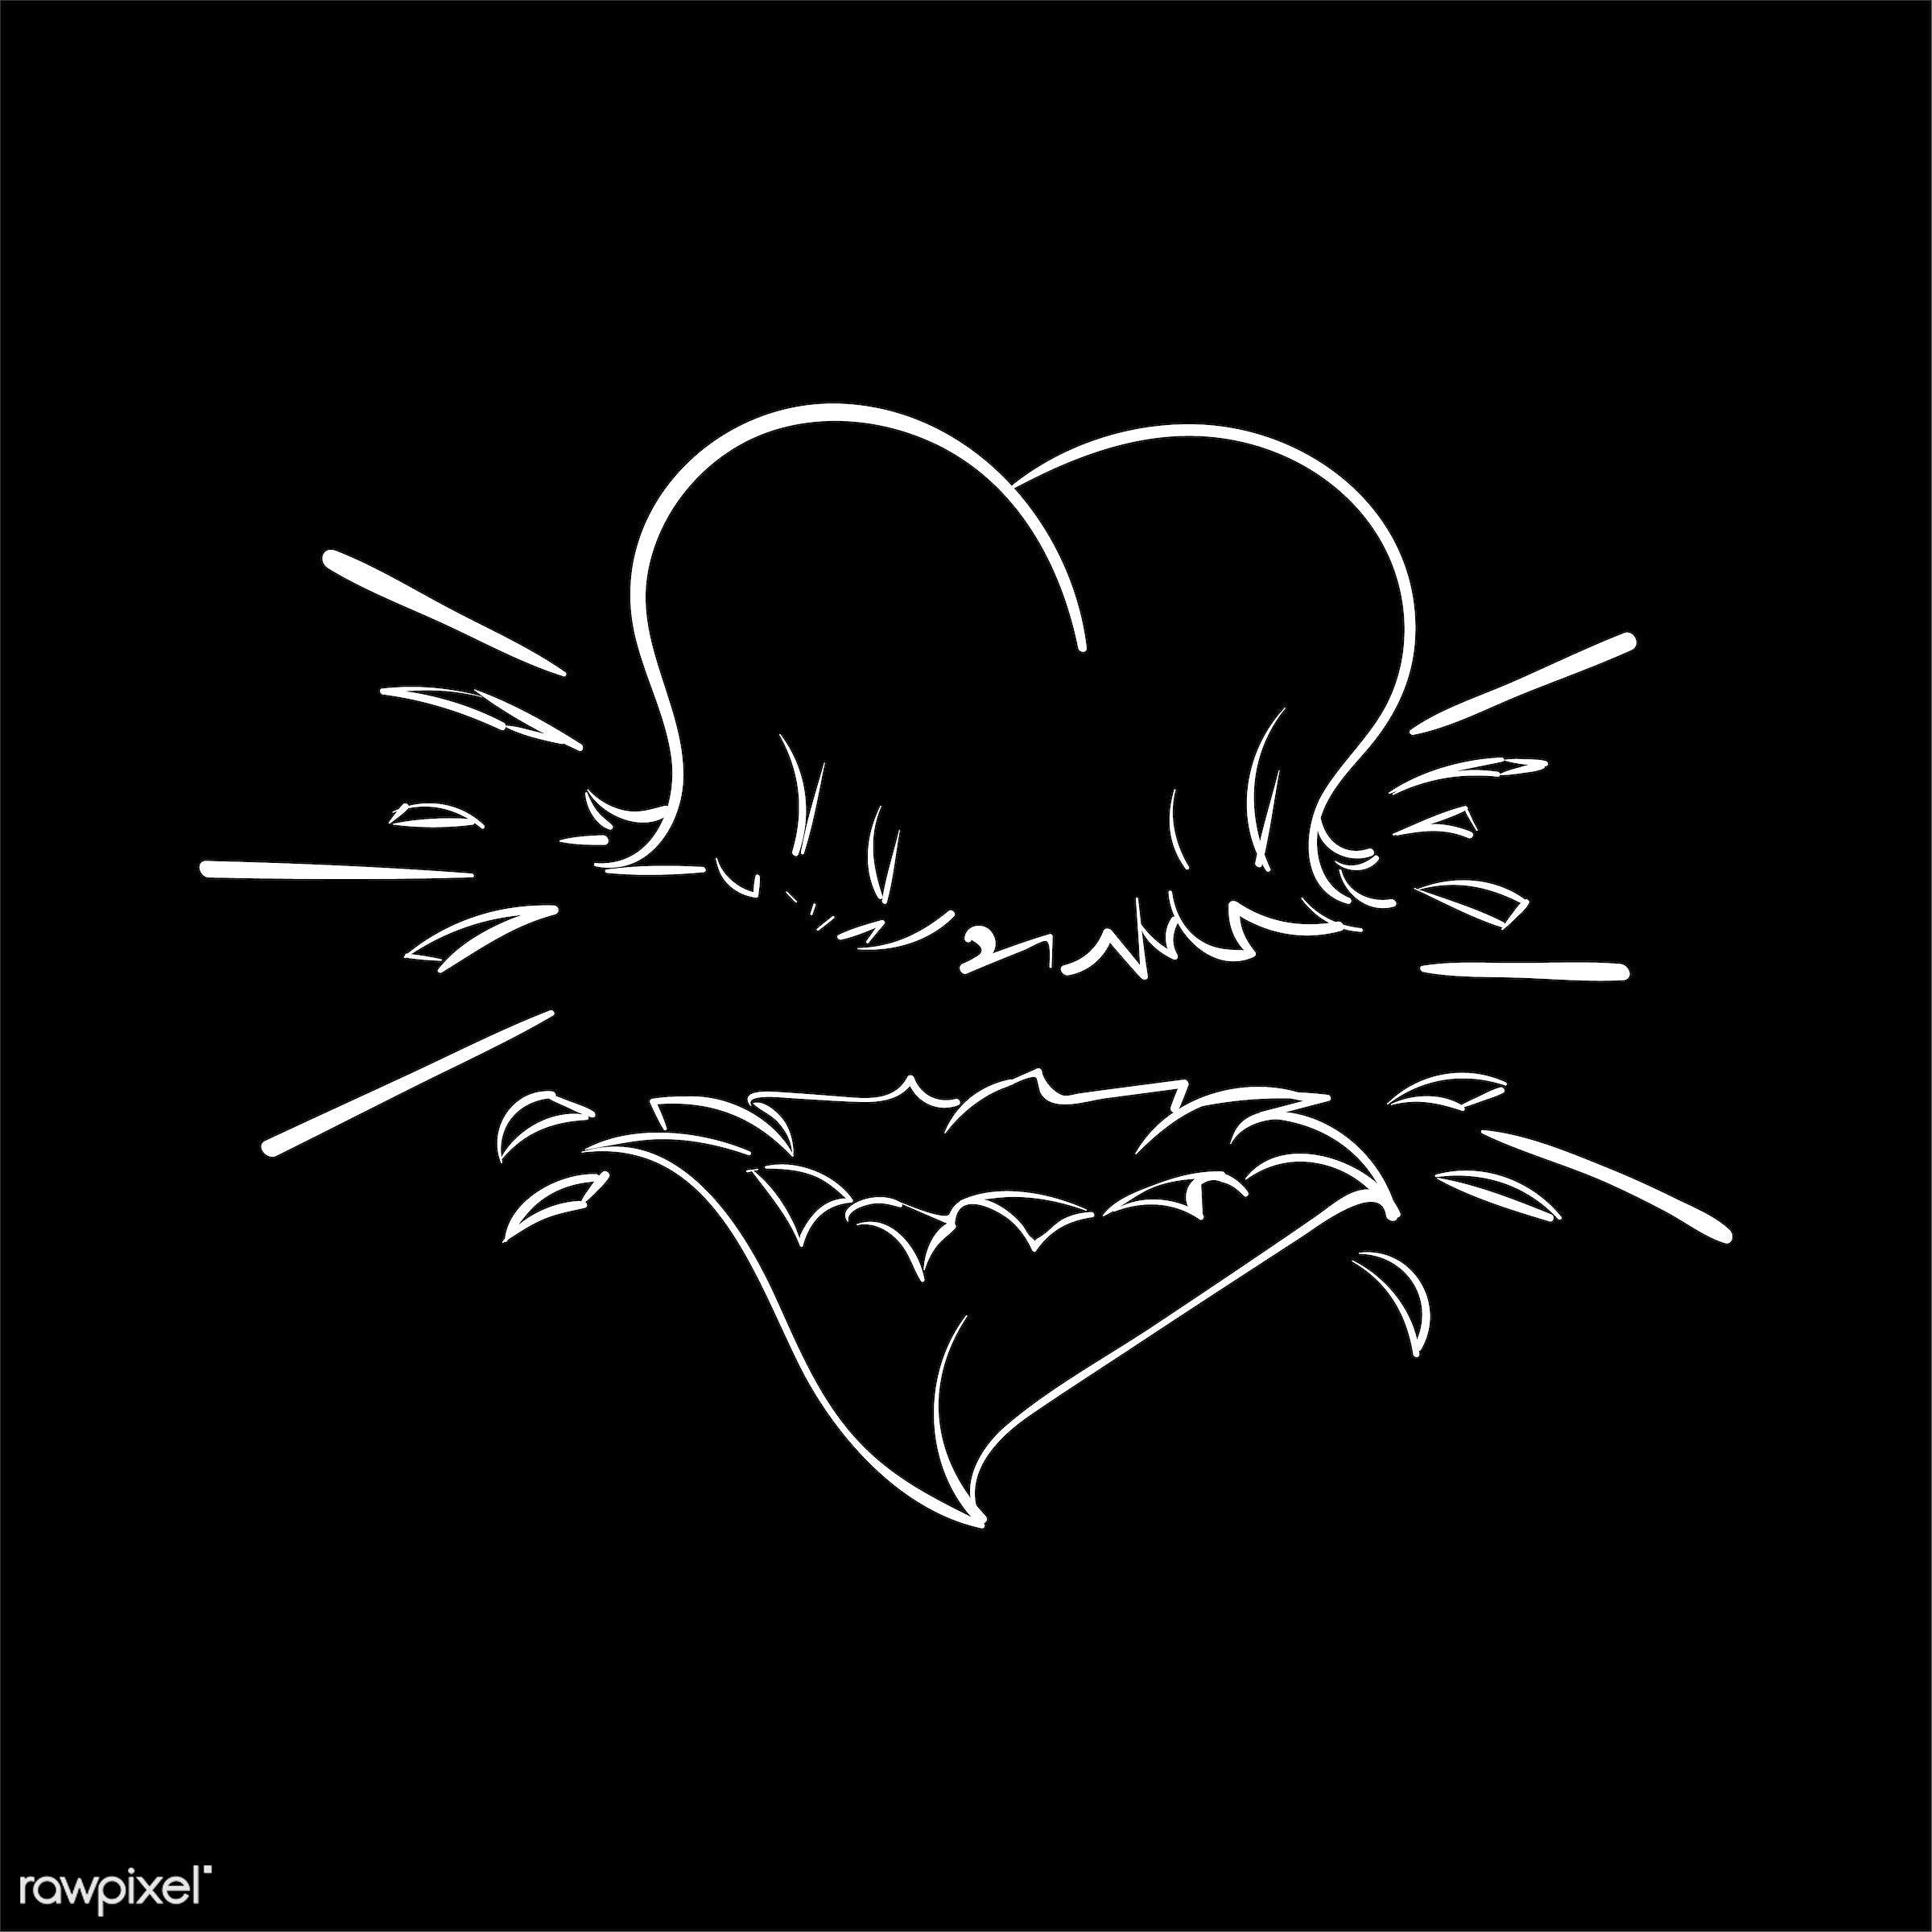 Hand drawing illustration set of love - art, artwork, breakup, broken heart, broken hearted, cares, collection, couple,...